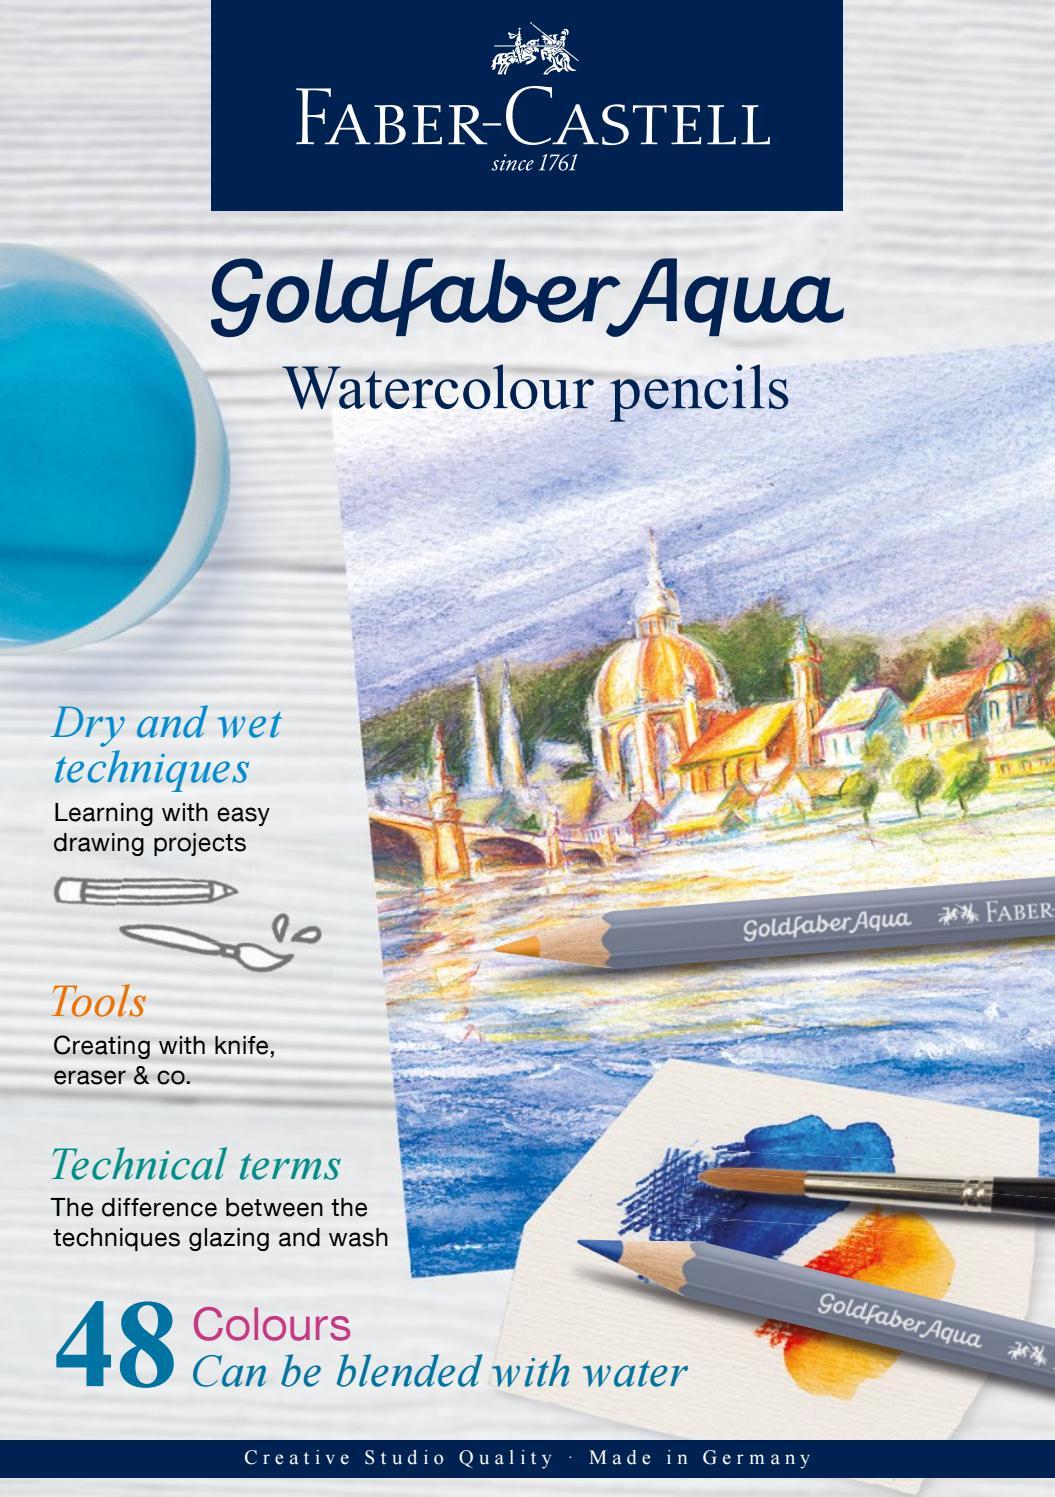 Faber-Castell Goldfaber Aqua Watercolour Pencil Emerald Green 163